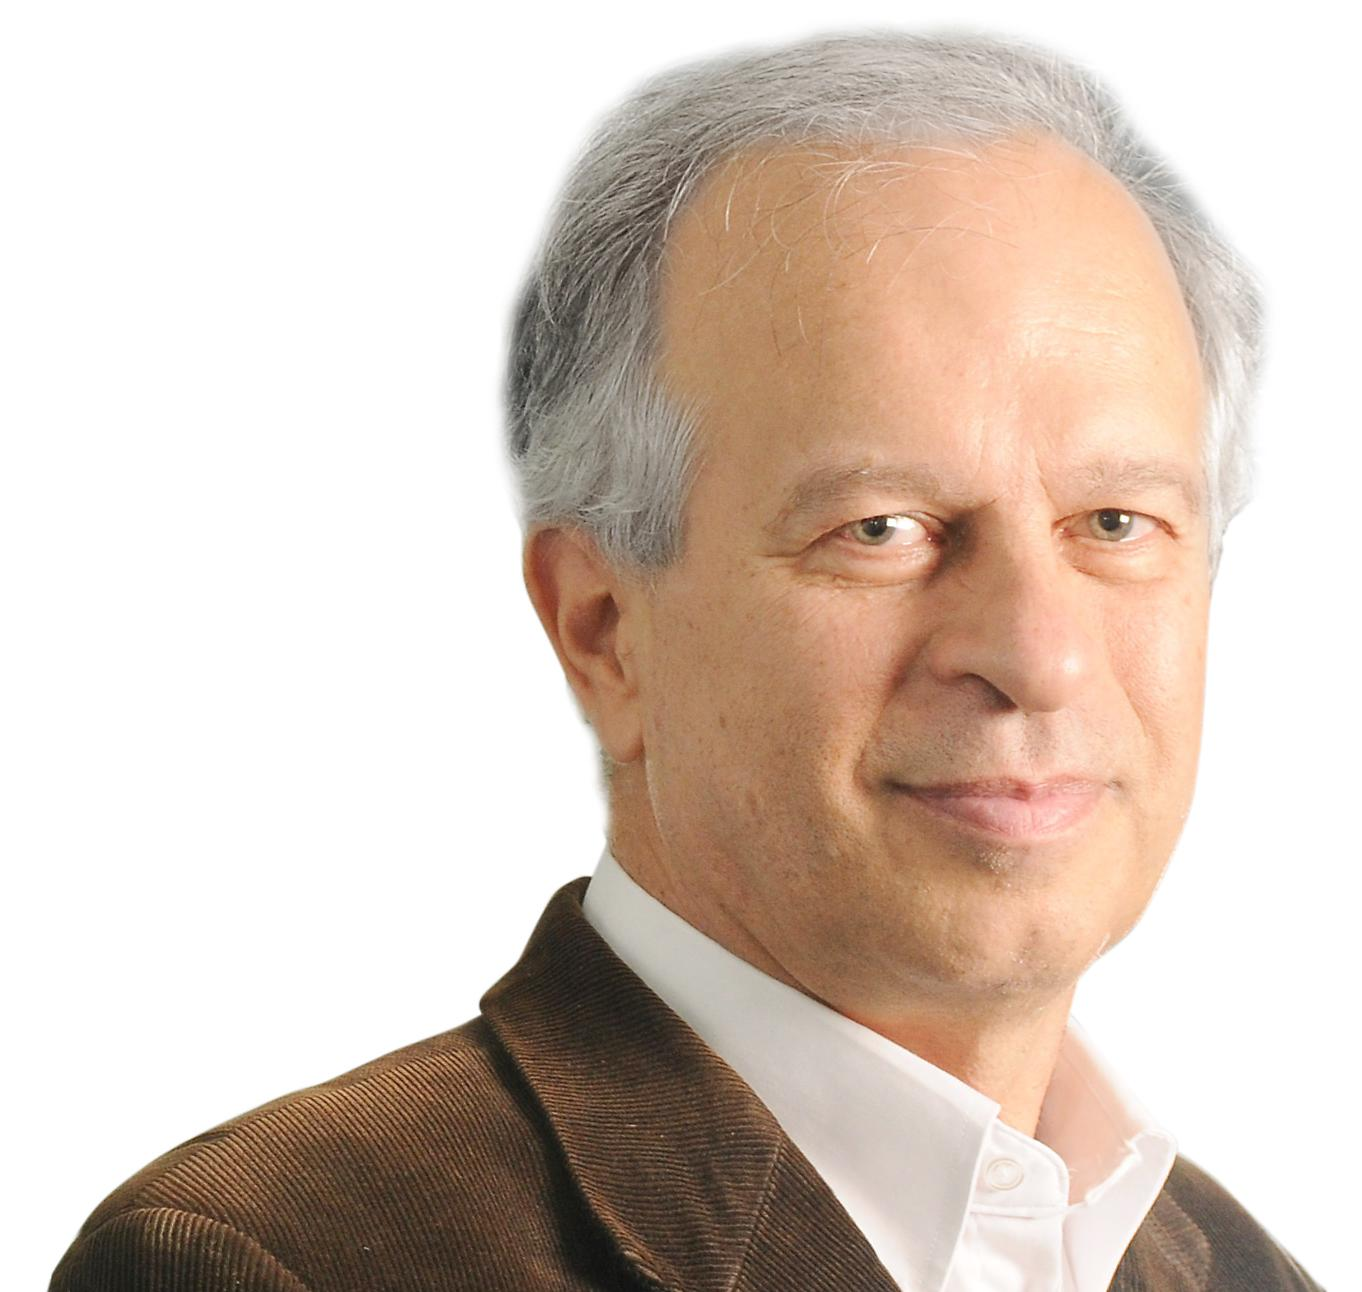 Renato Janine: Michel Temer é hoje o mais forte vice que o país já teve